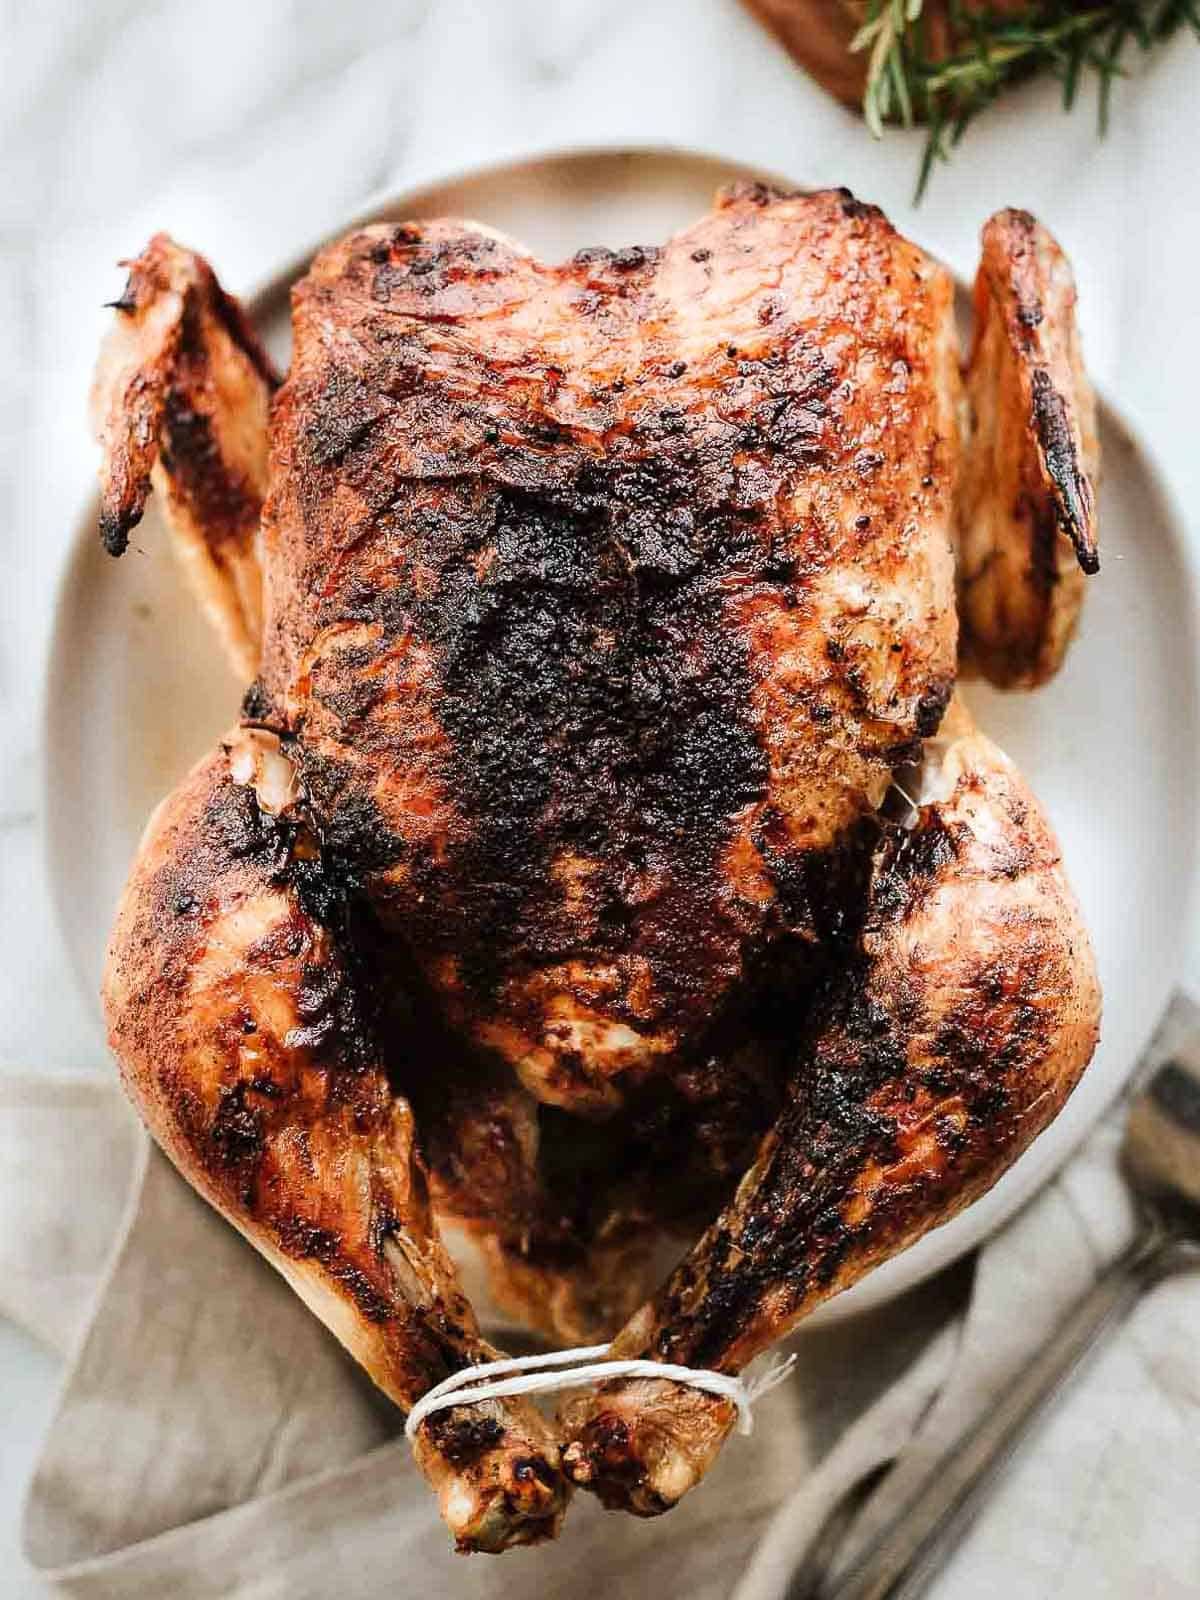 Air fryer whole chicken on platter.